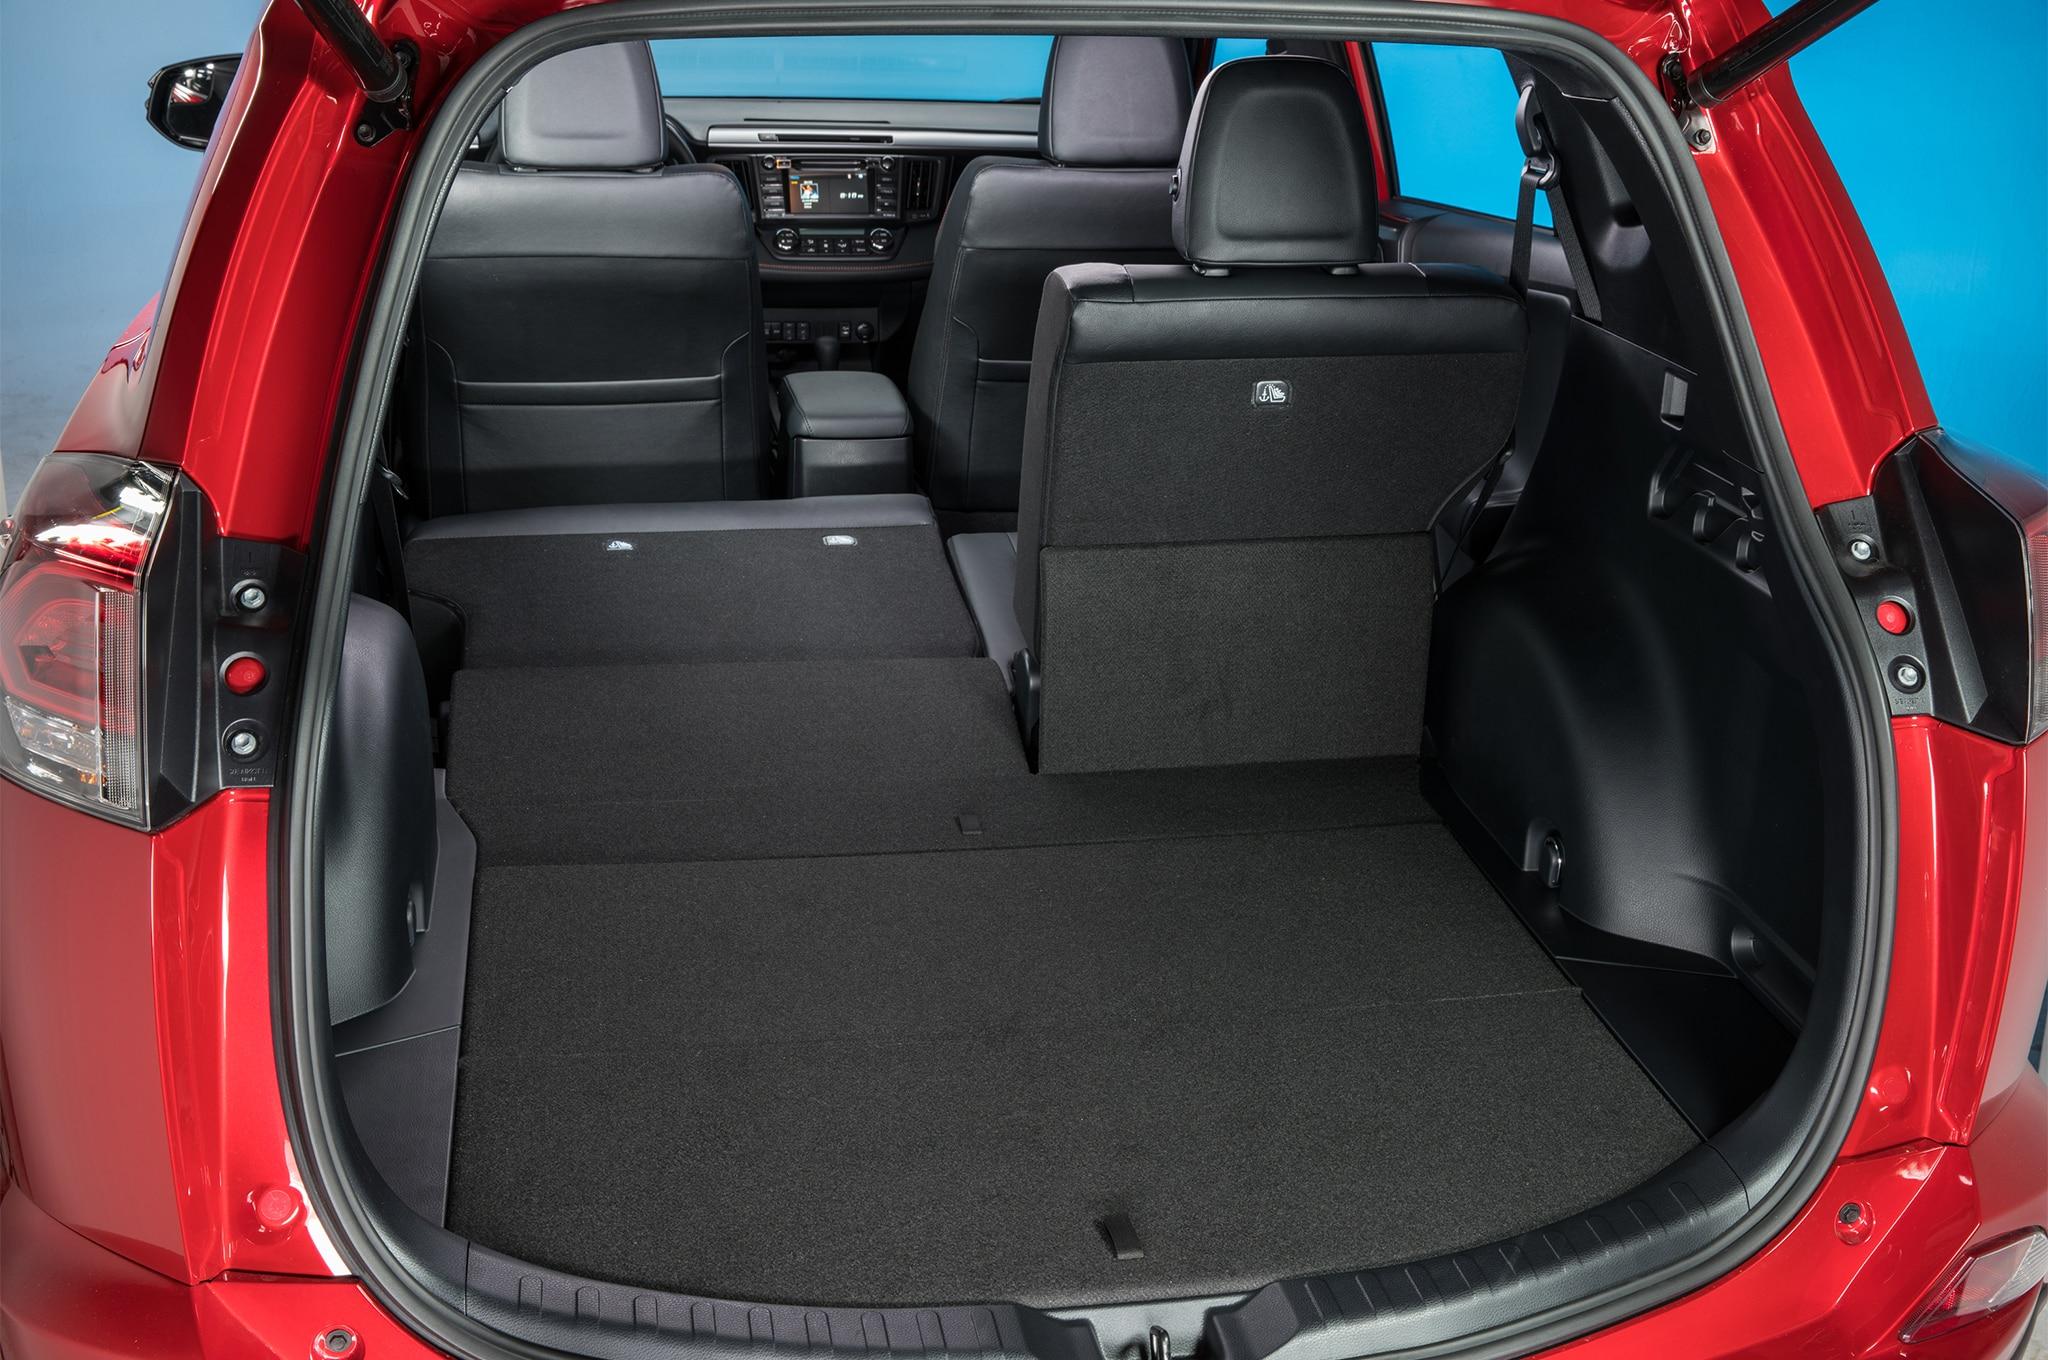 2017 Toyota Rav4 Se Cargo Space 02 Motor Trend En Espa 241 Ol